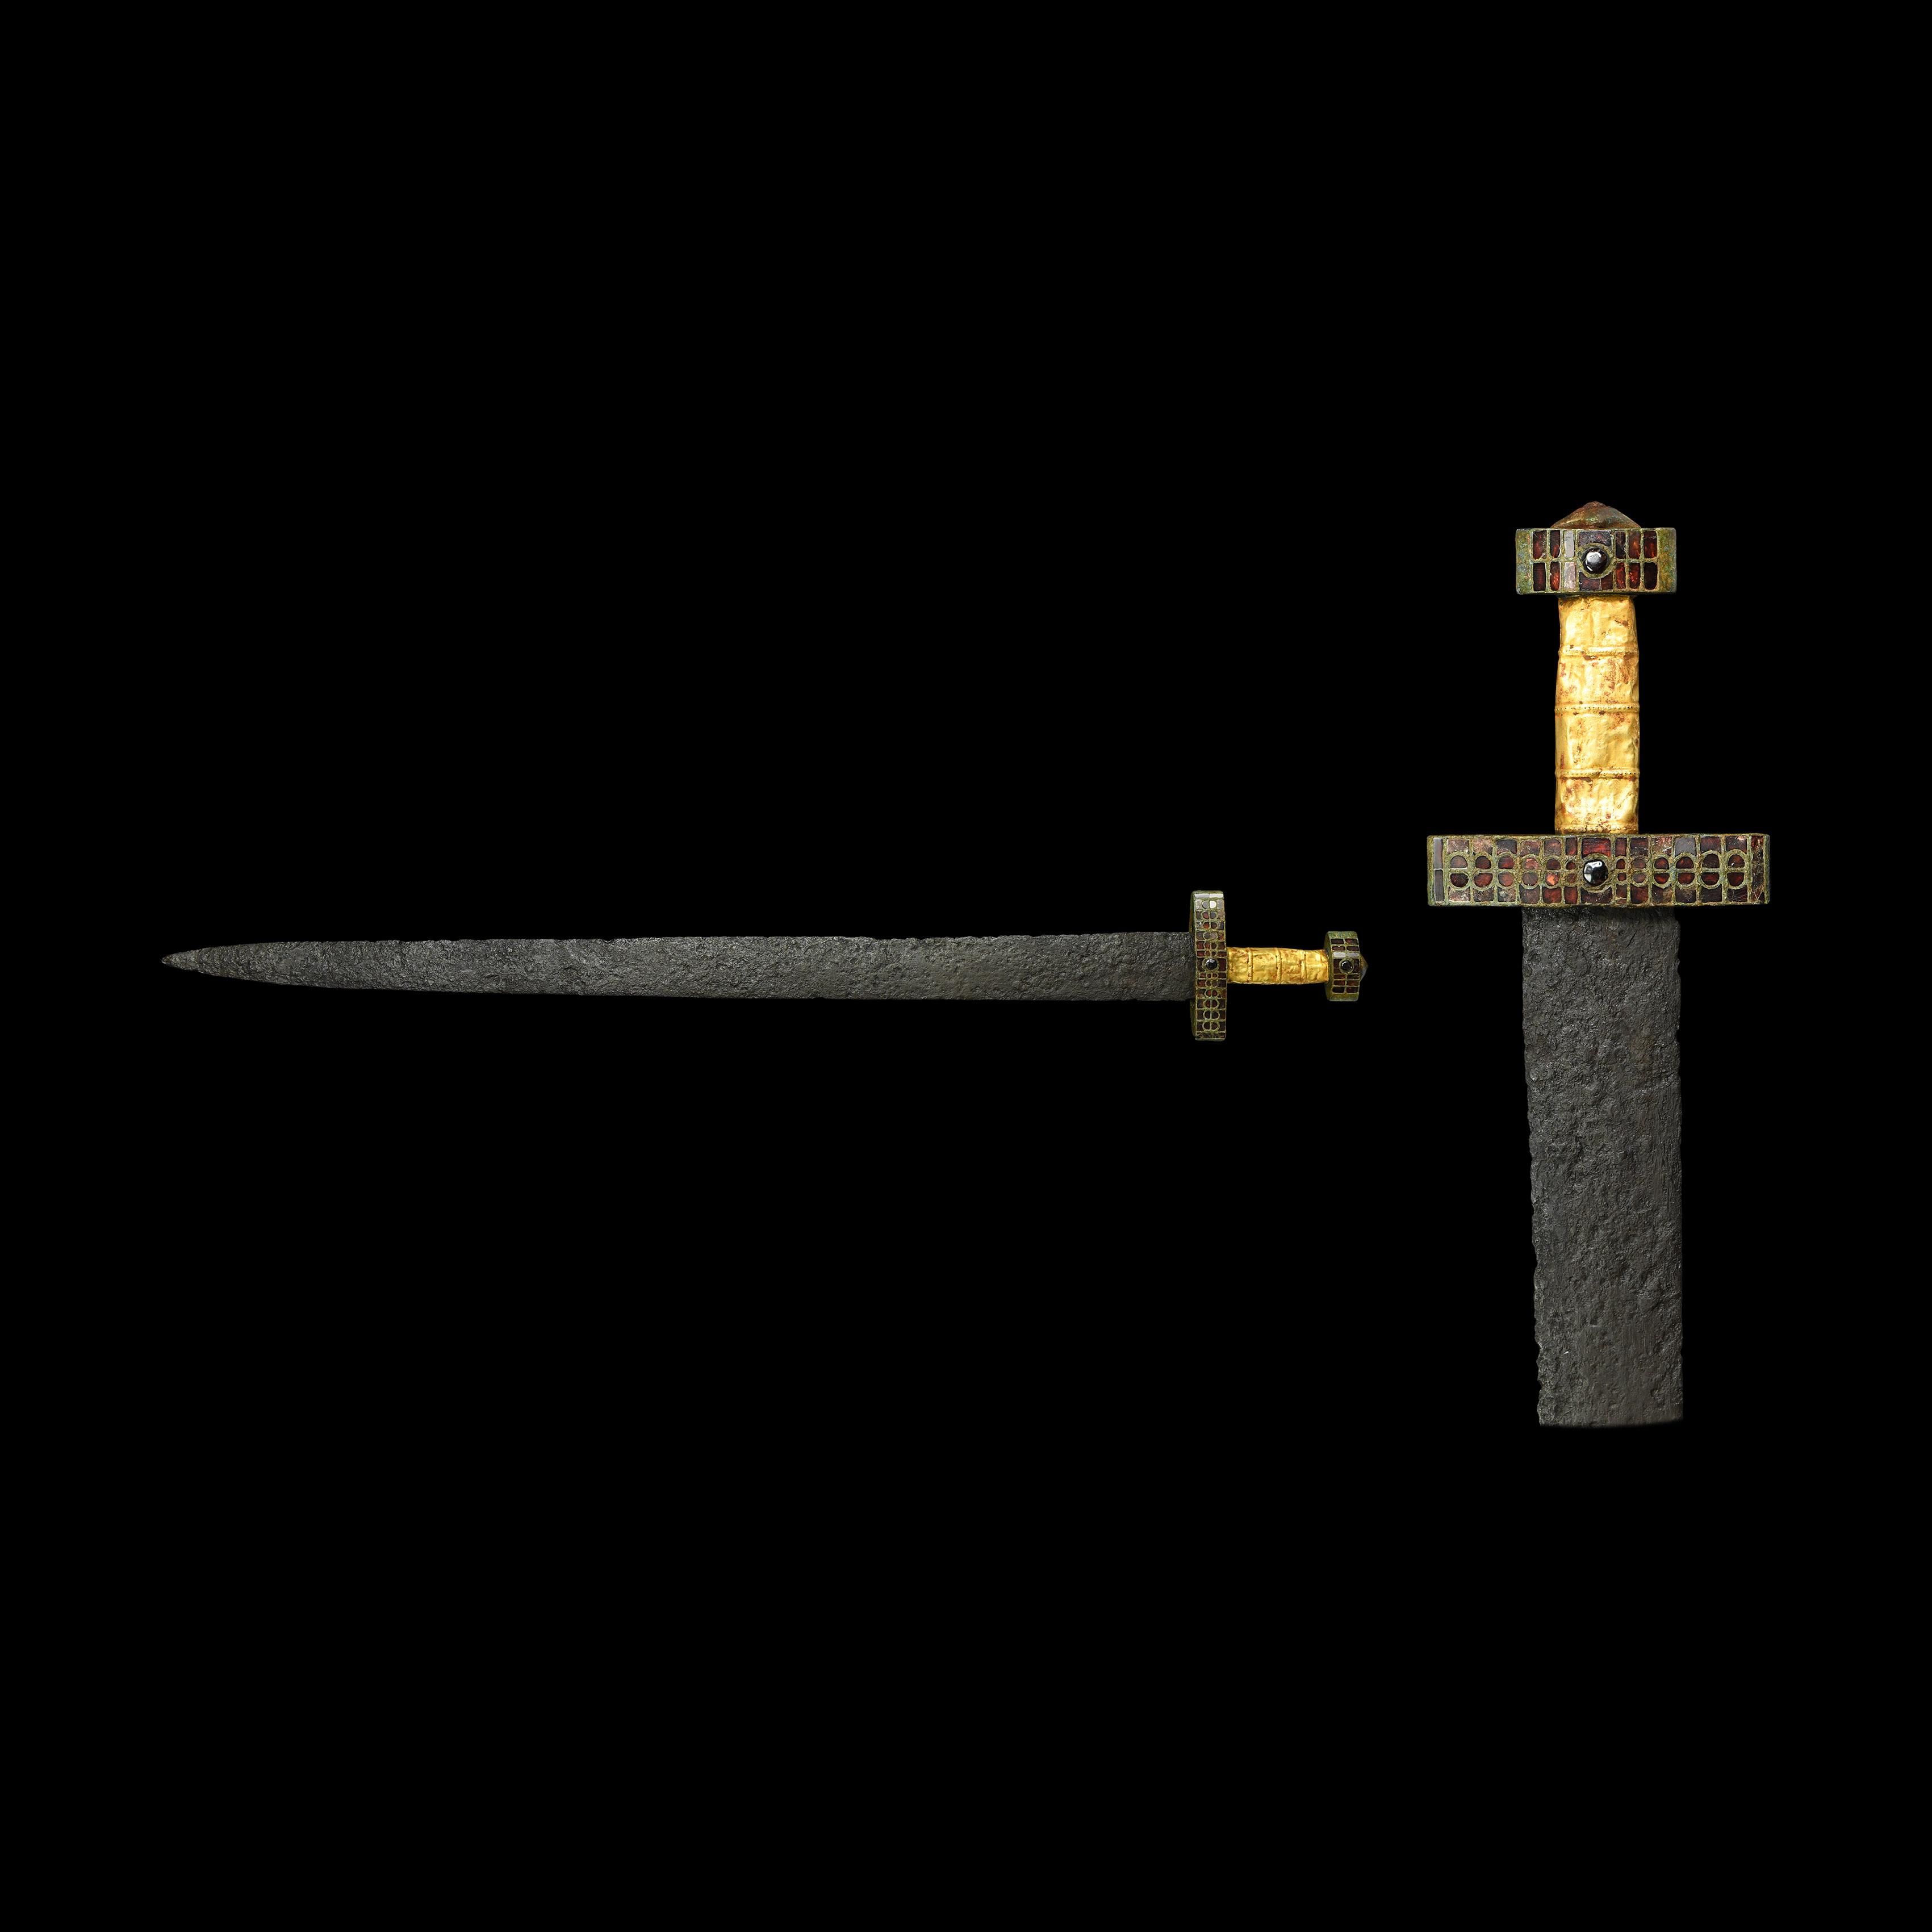 Merovingian or Eastern Roman Sword with Jewelled Hilt